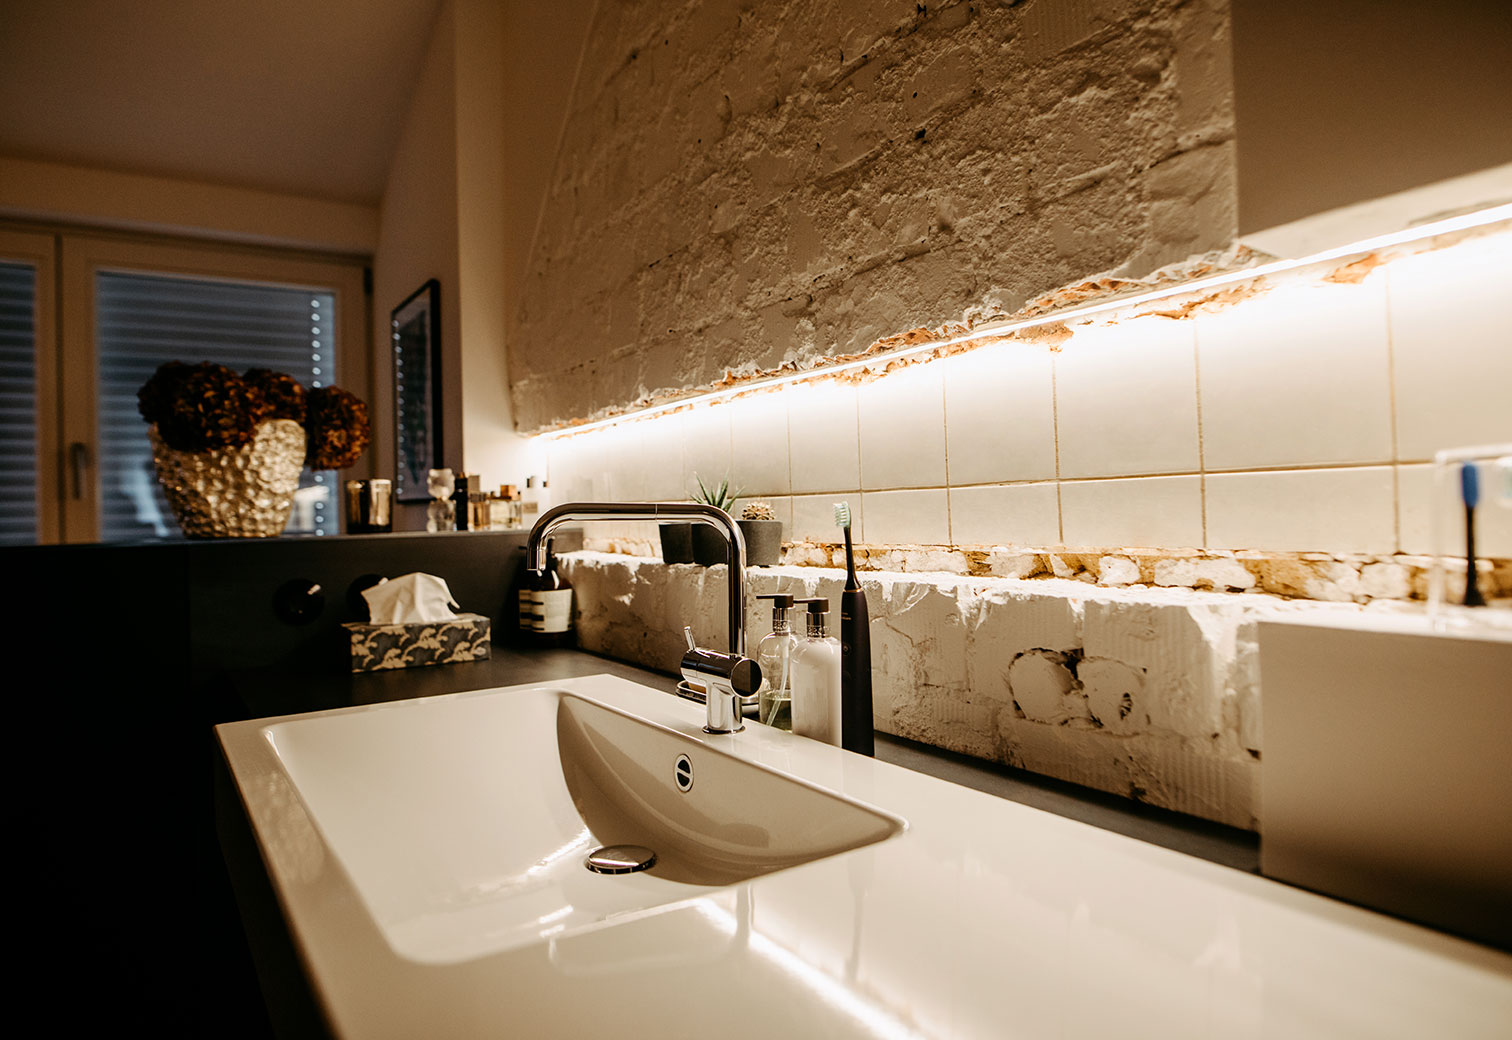 Installation Beleuchtung Badezimmer